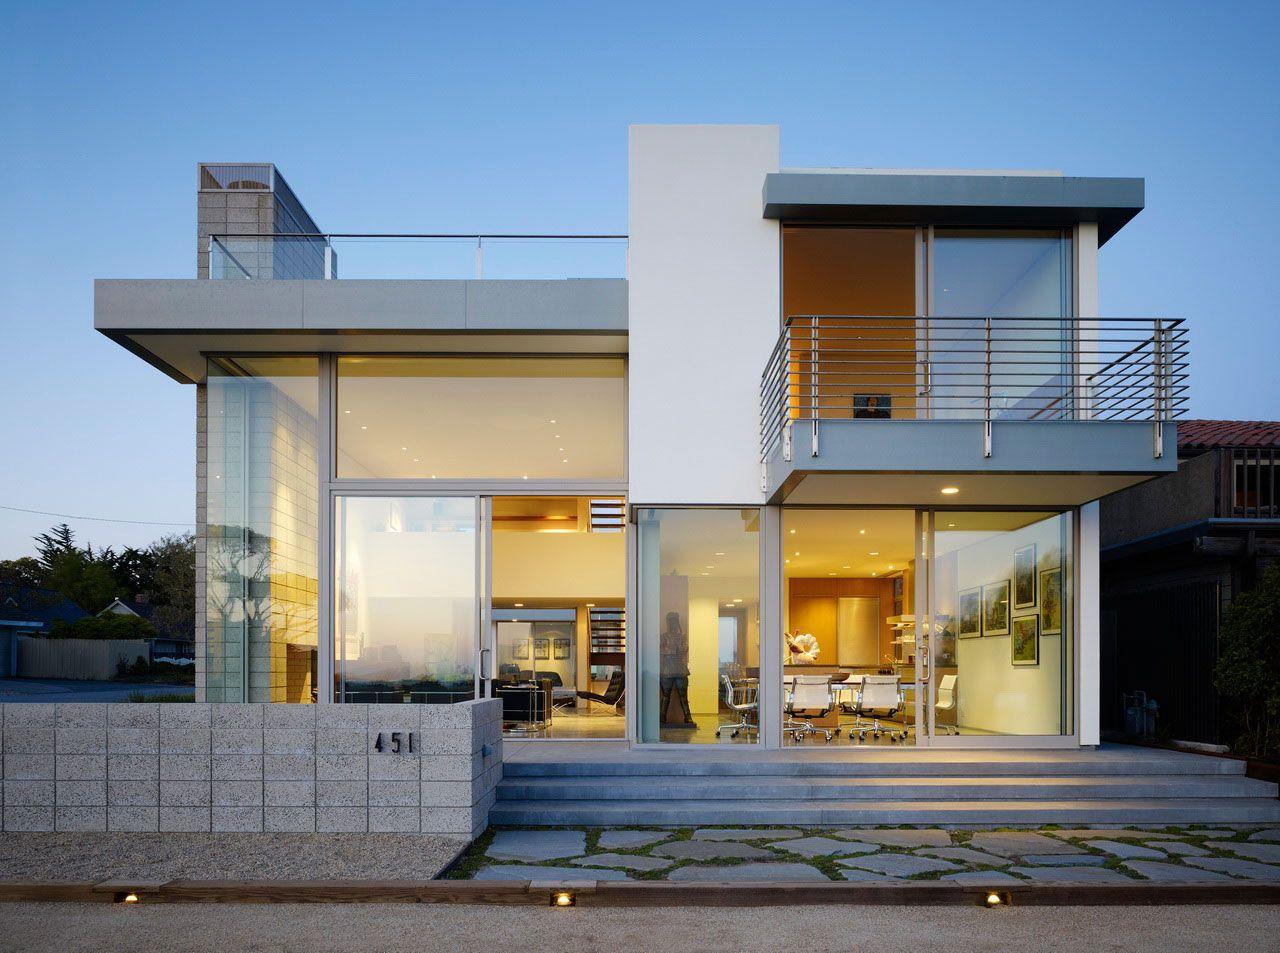 attractive home designs ideas photo gallery